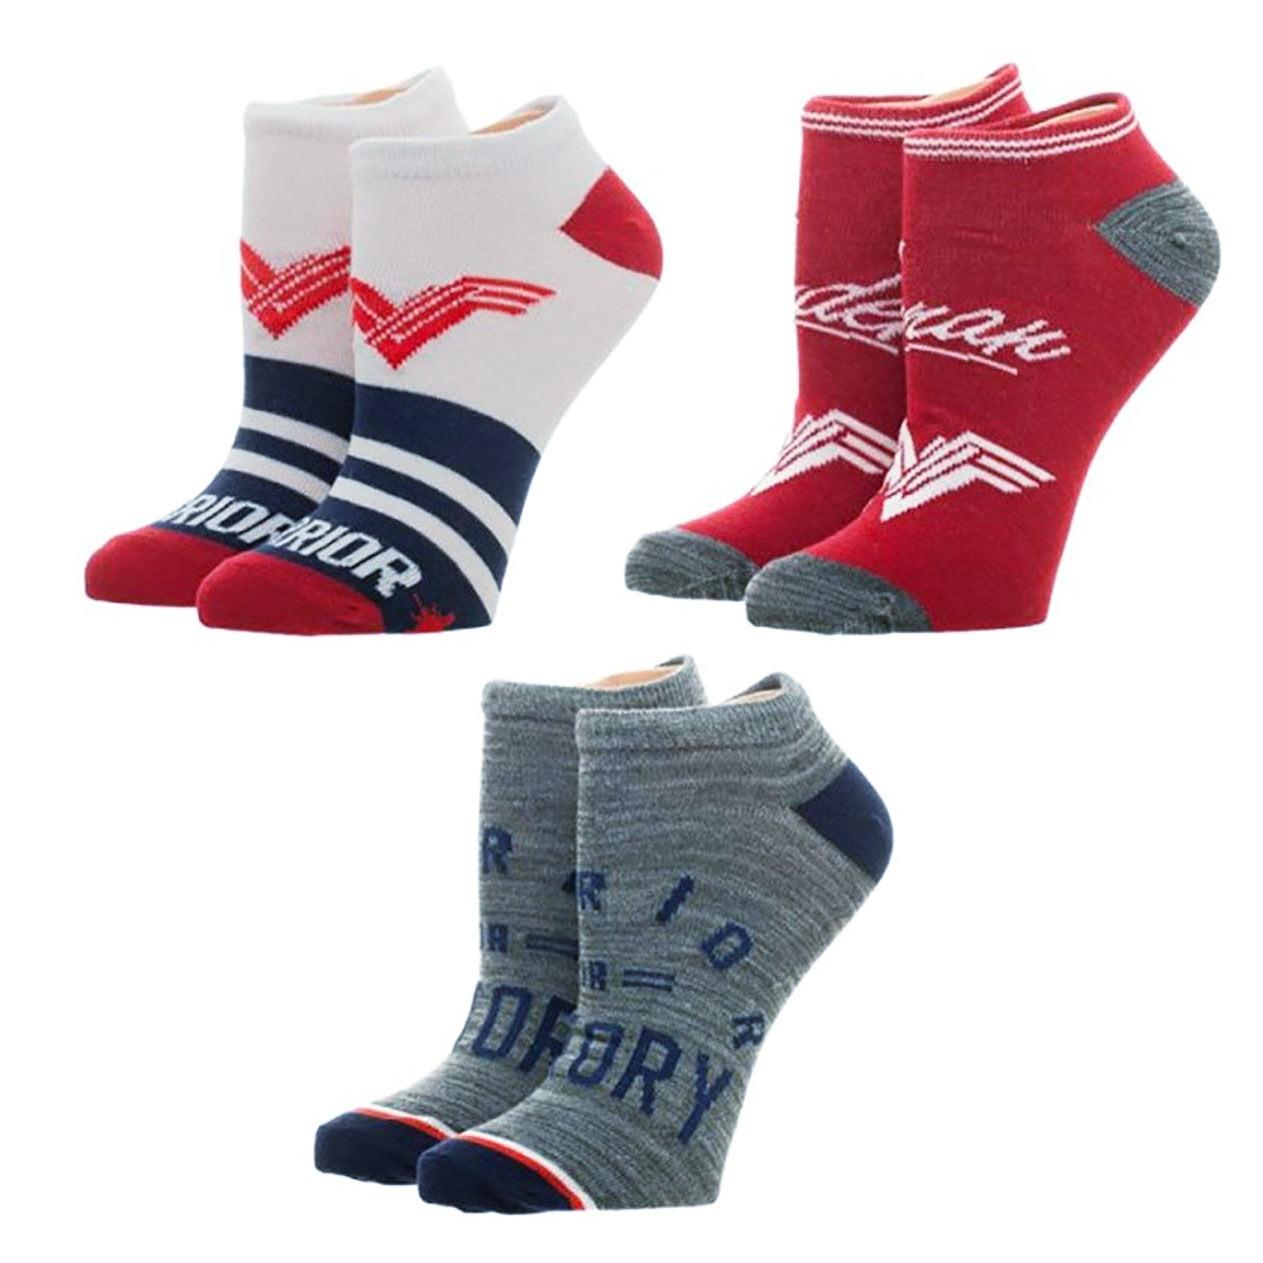 Wonder Woman Ankle Socks Set